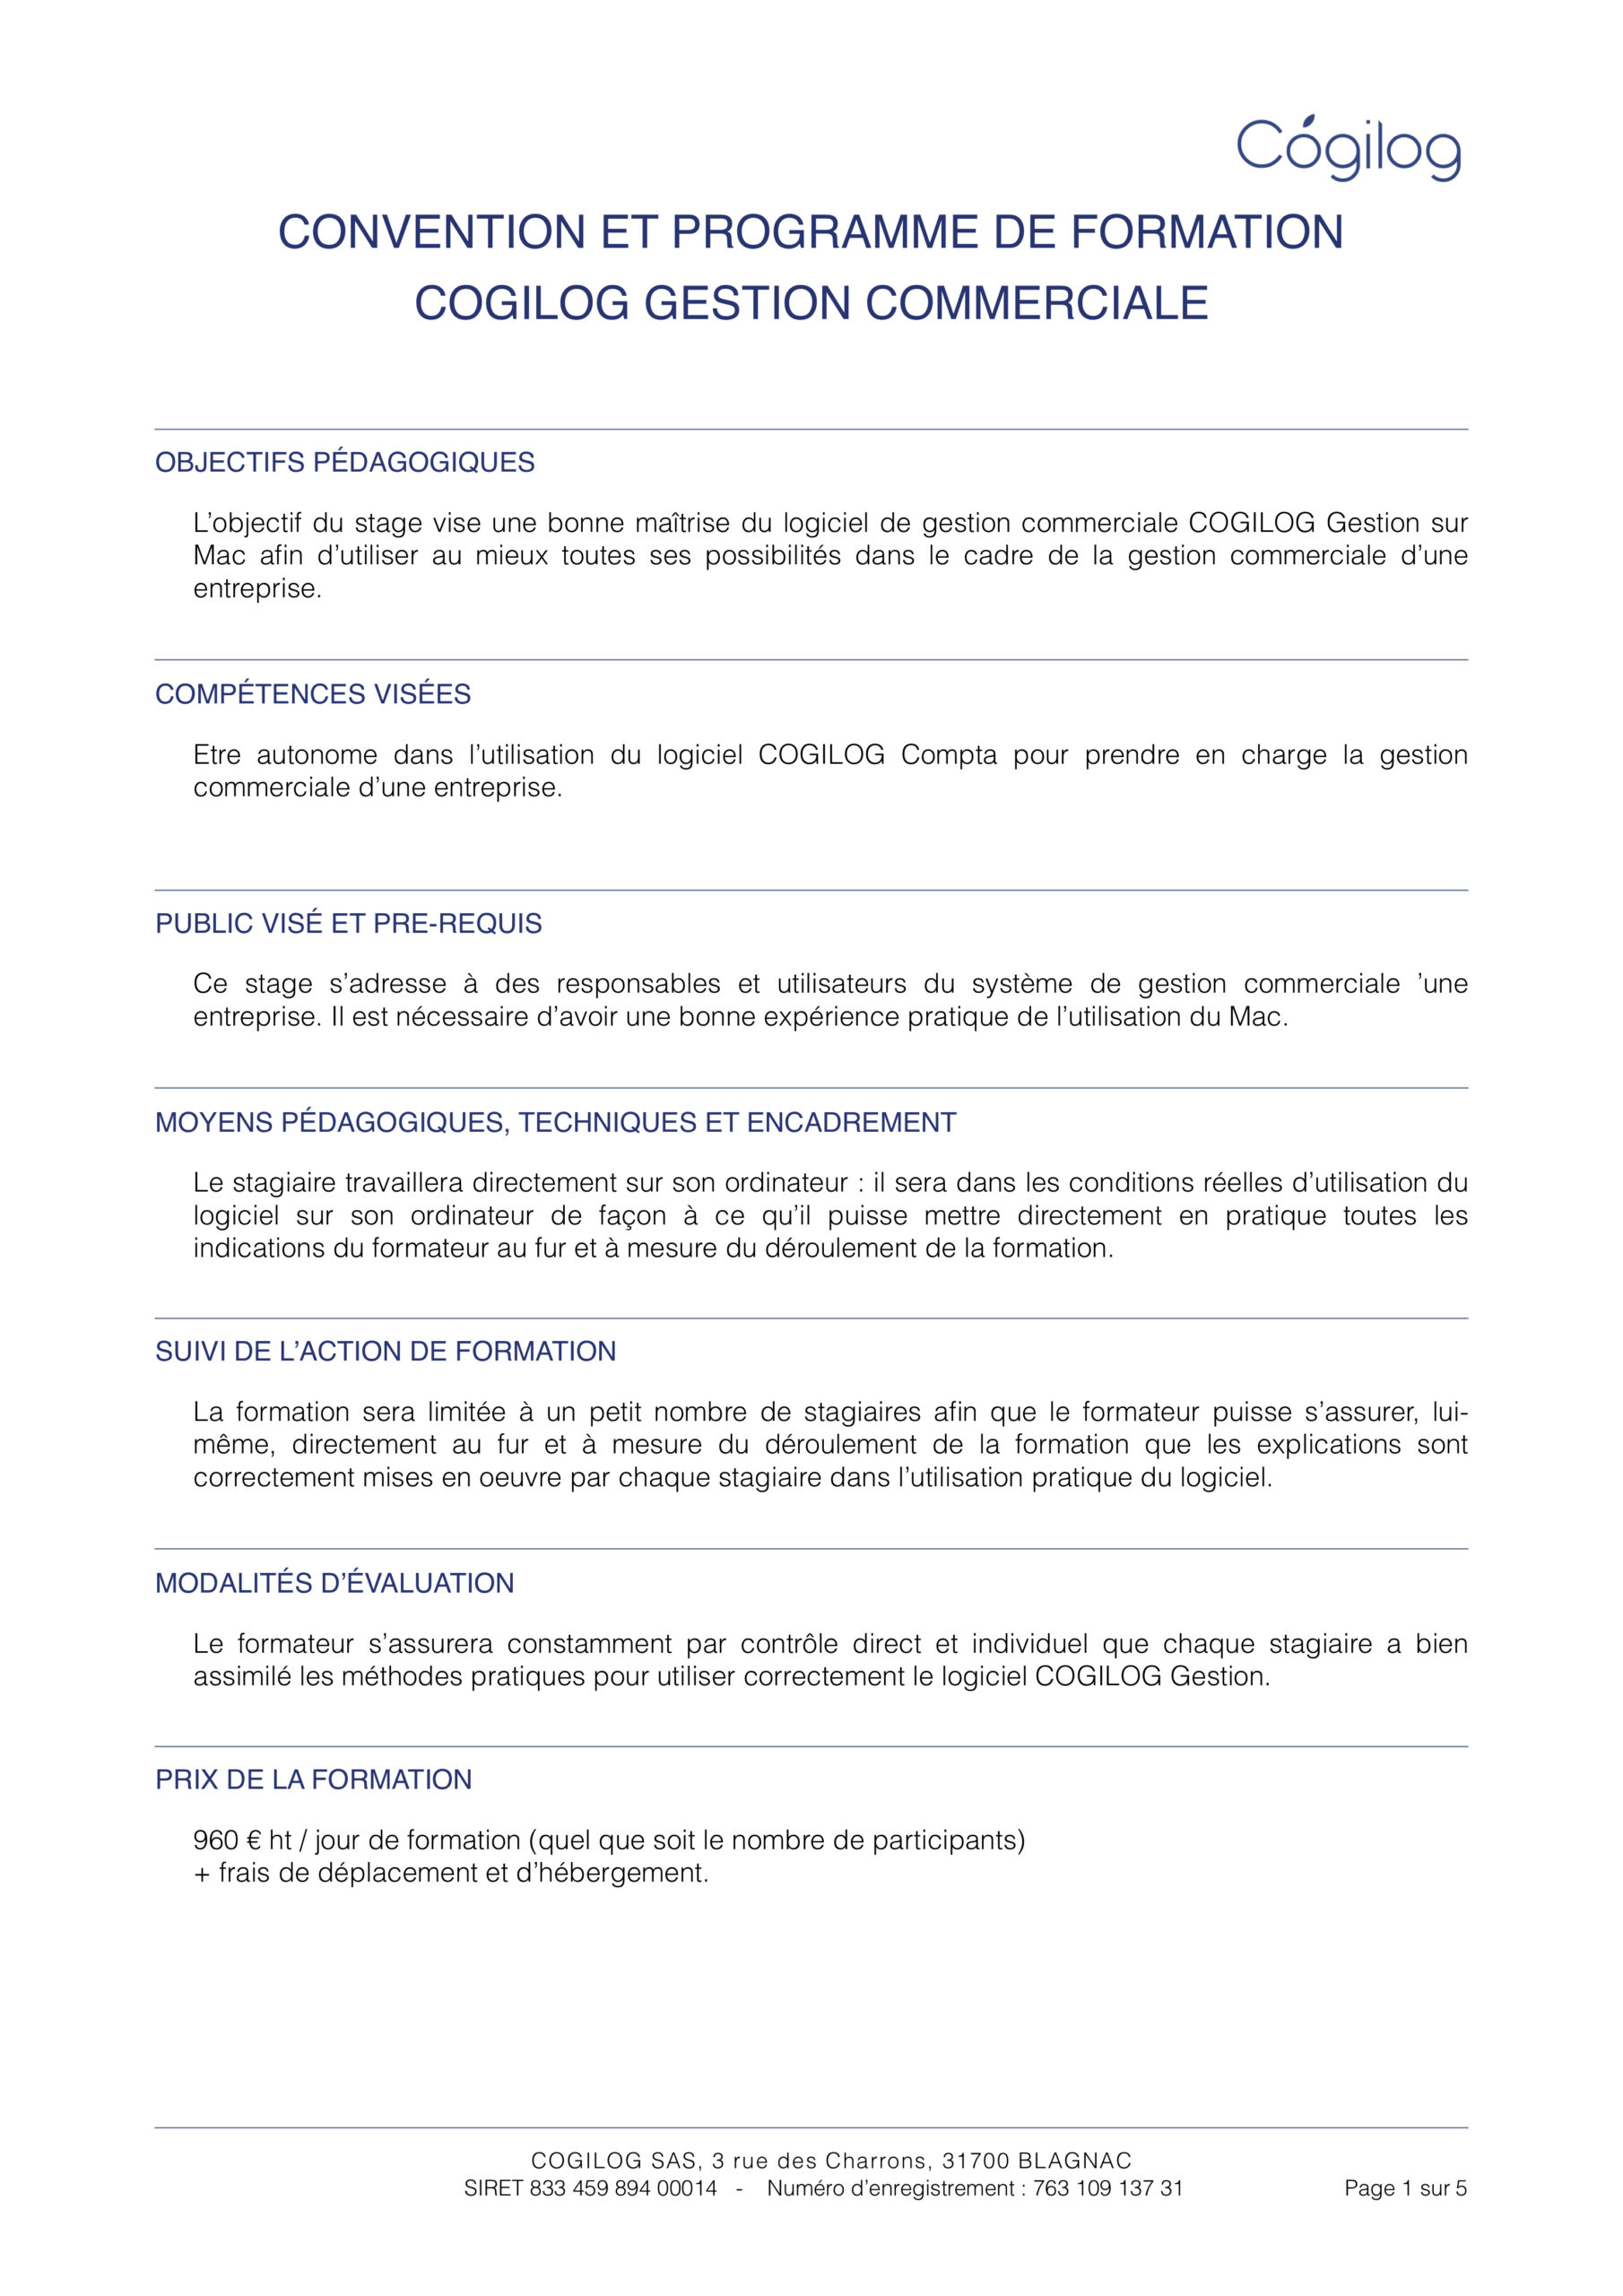 Programme de formation COGILOG Gestion